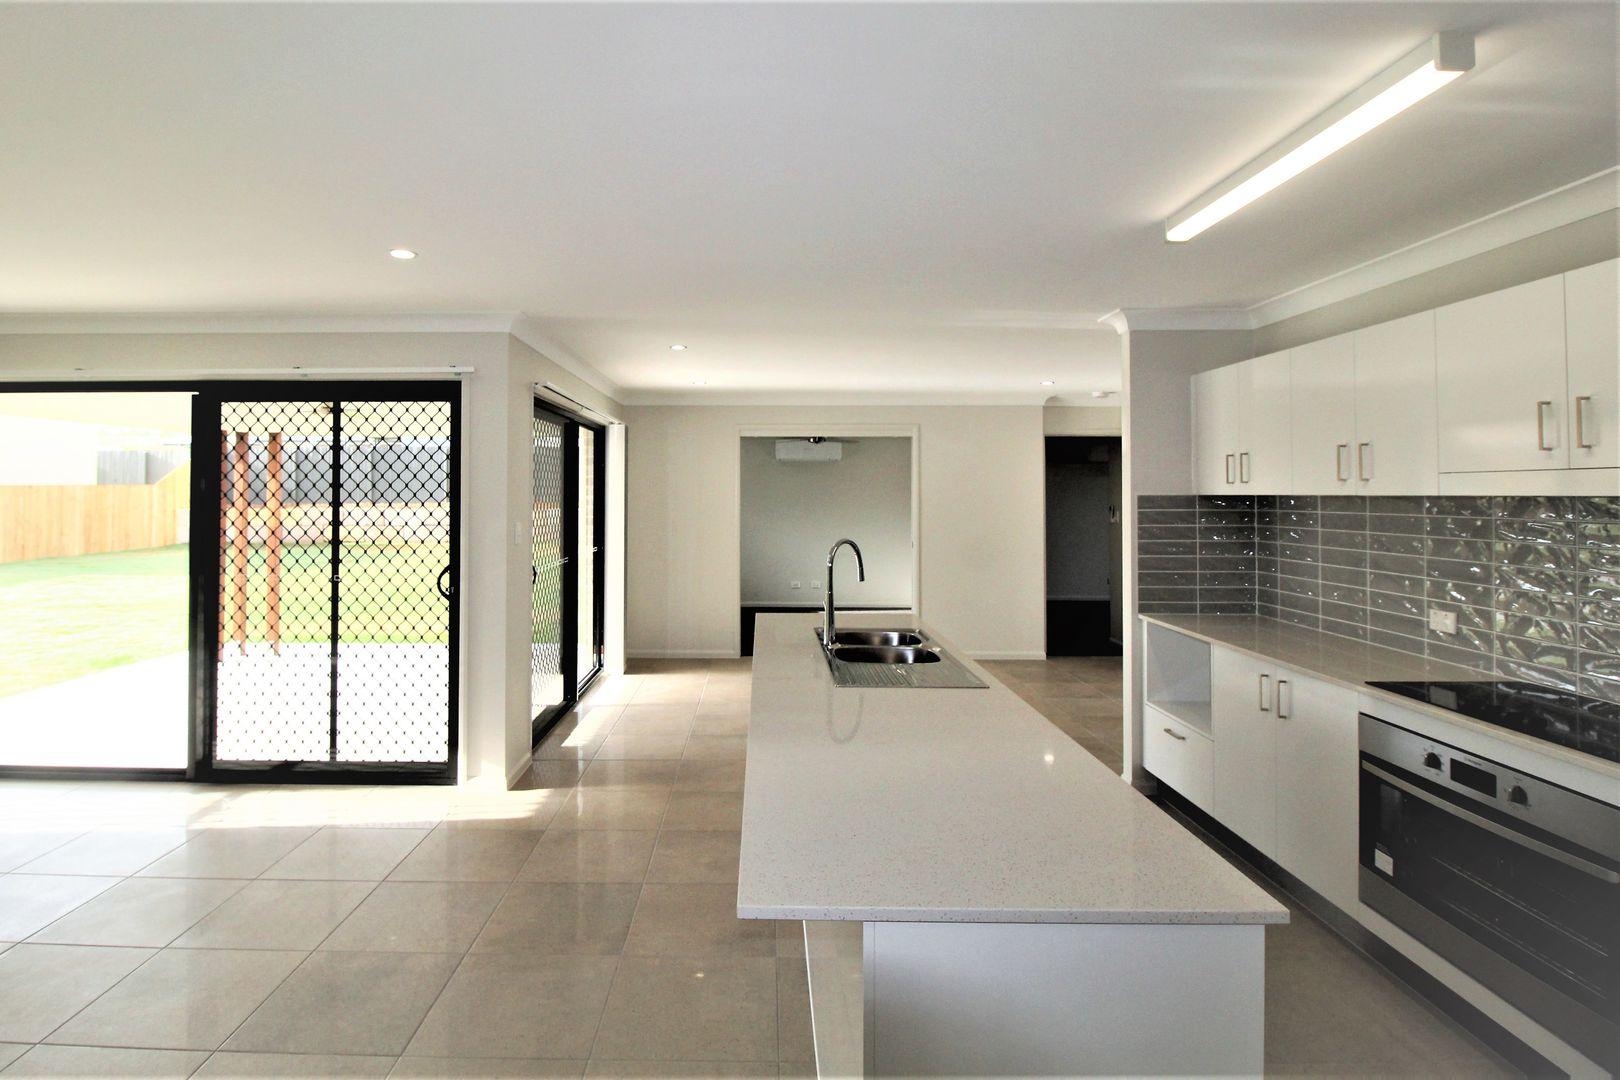 Lot/19 Bantry Court, Parkhurst QLD 4702, Image 2